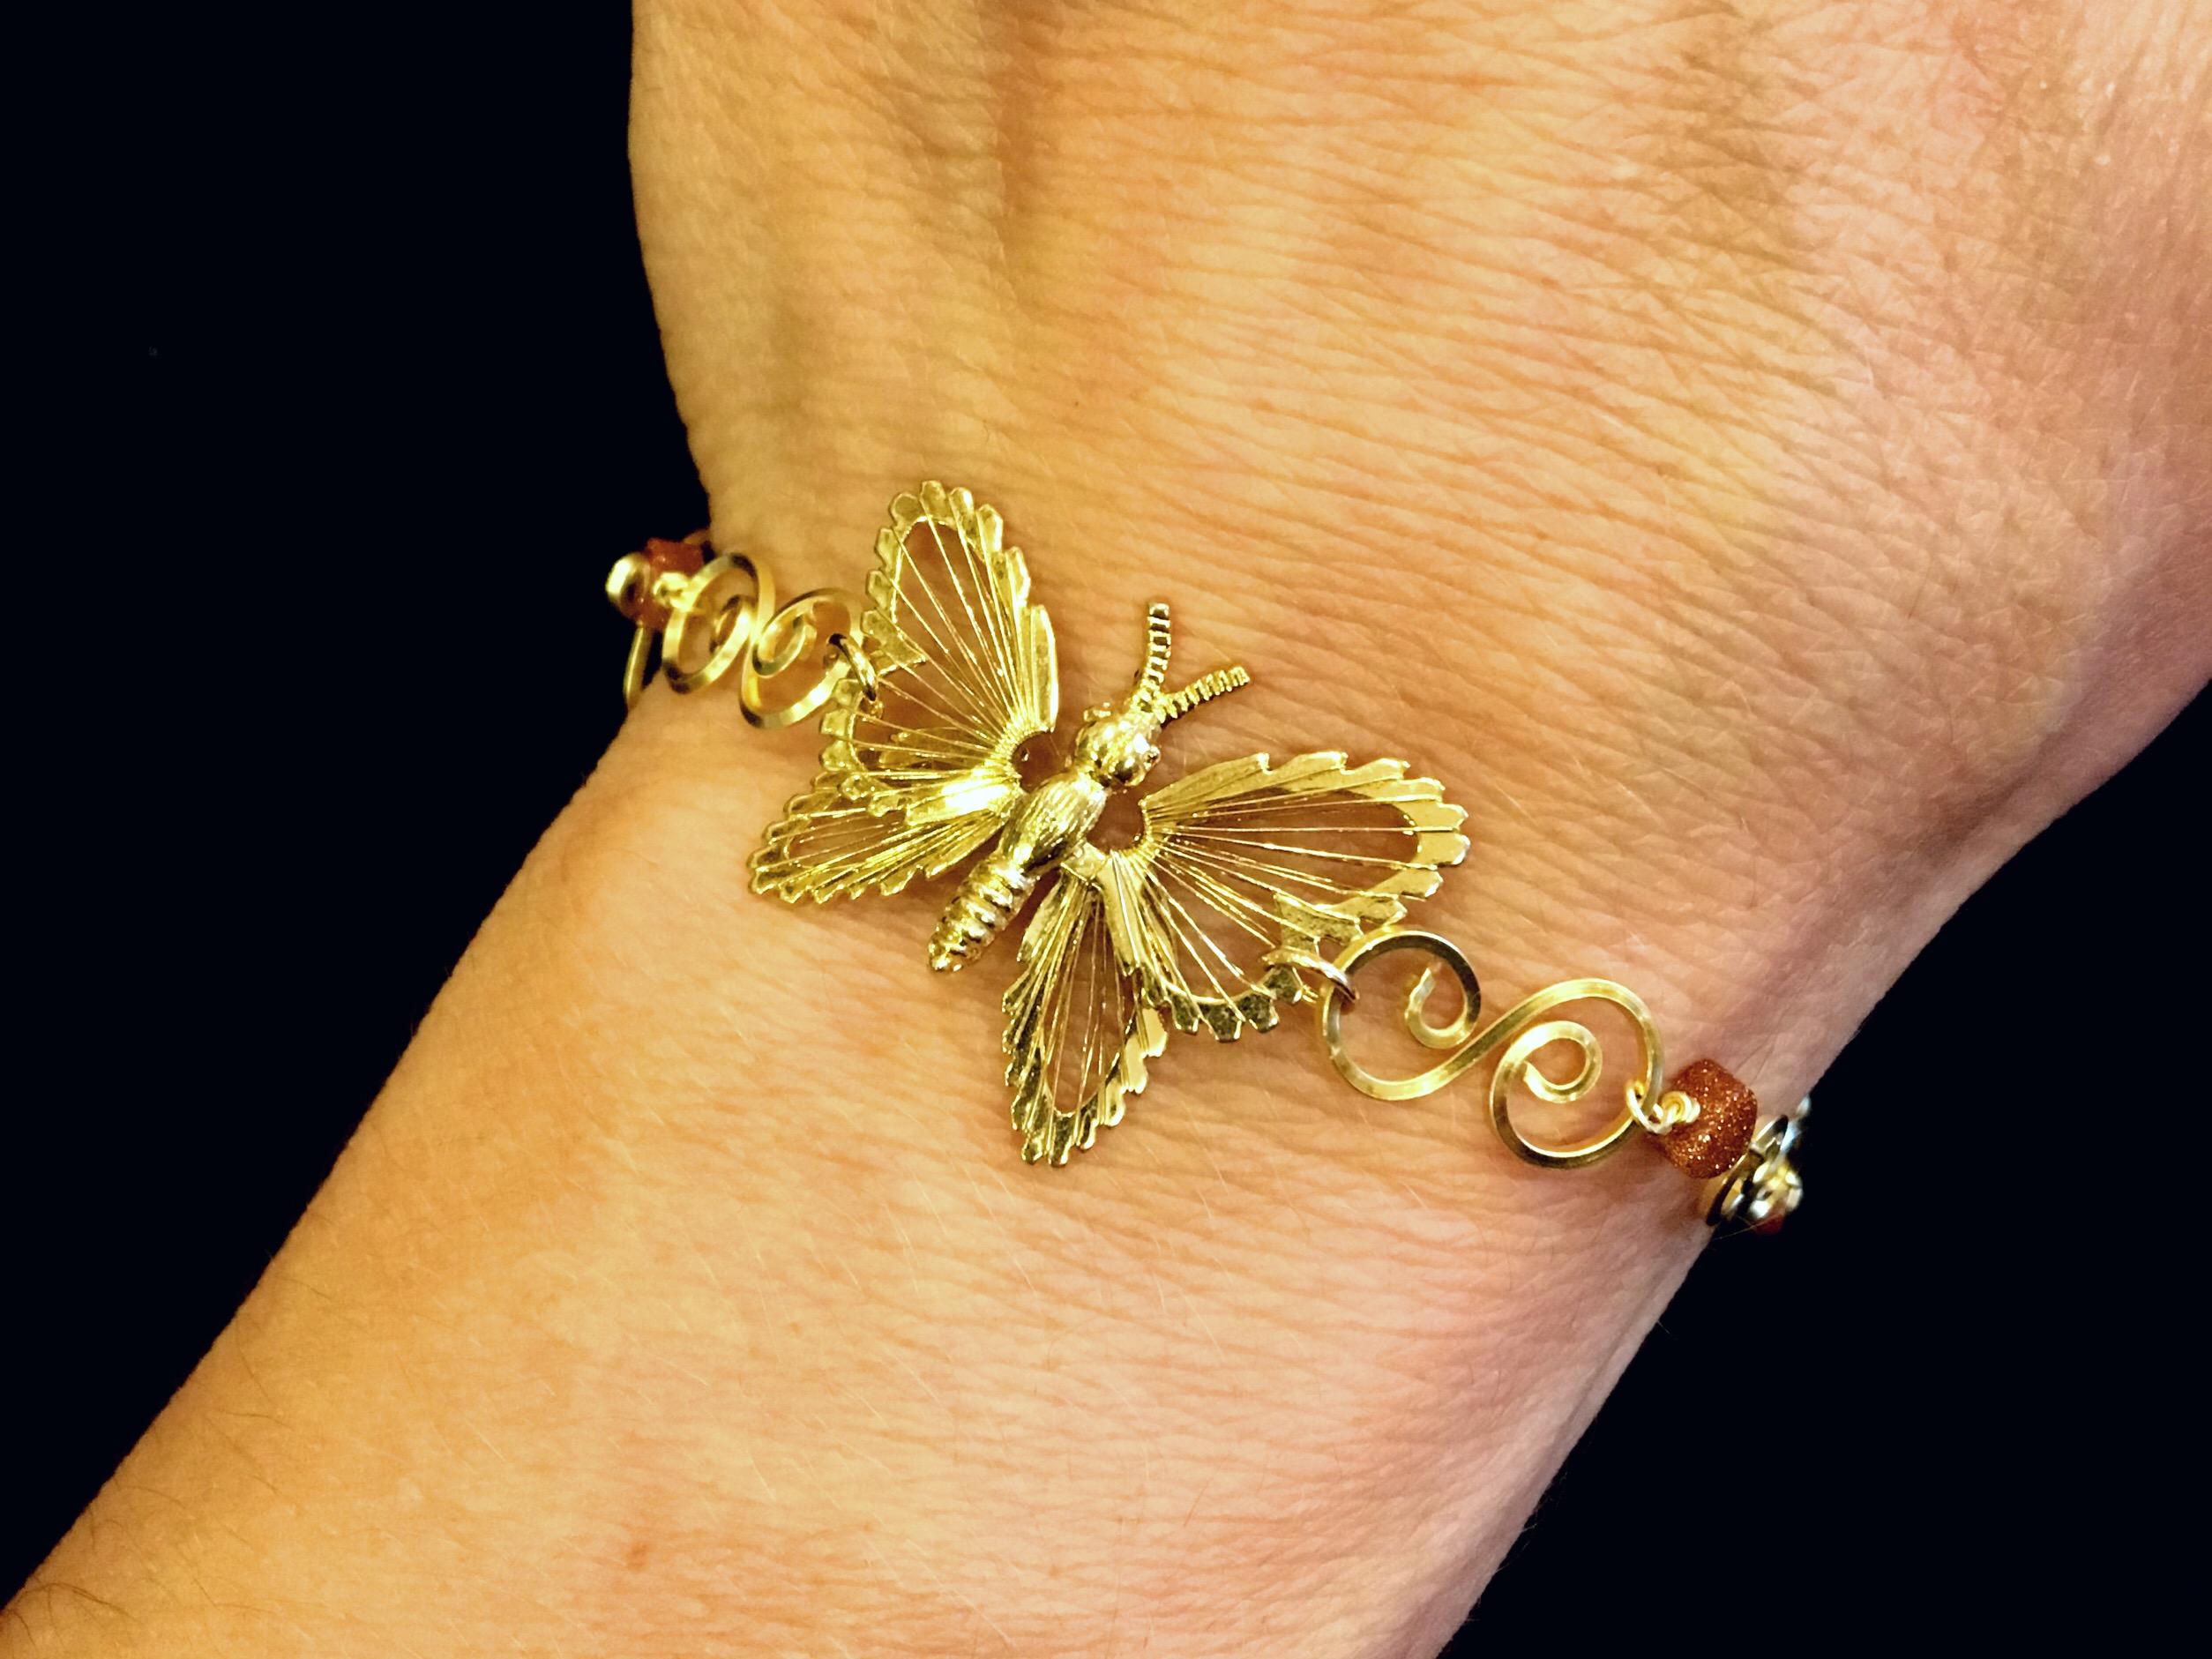 Dainty Deva Bracelet on hand- Goldfileld Butterflies - Silver Plated Gold Color